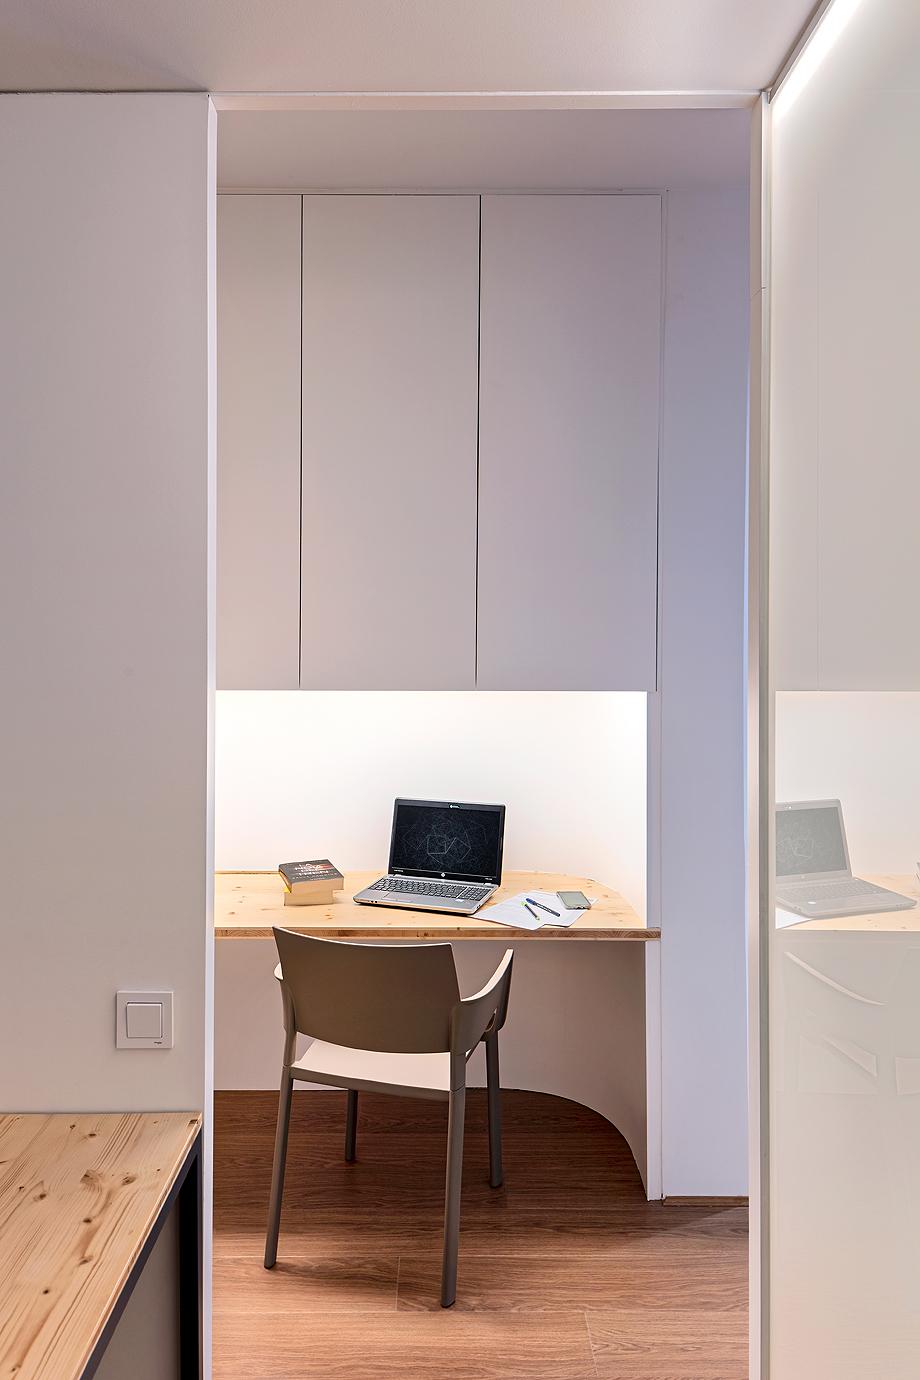 vivienda de alquiler diseño low cost agusti costa (3)